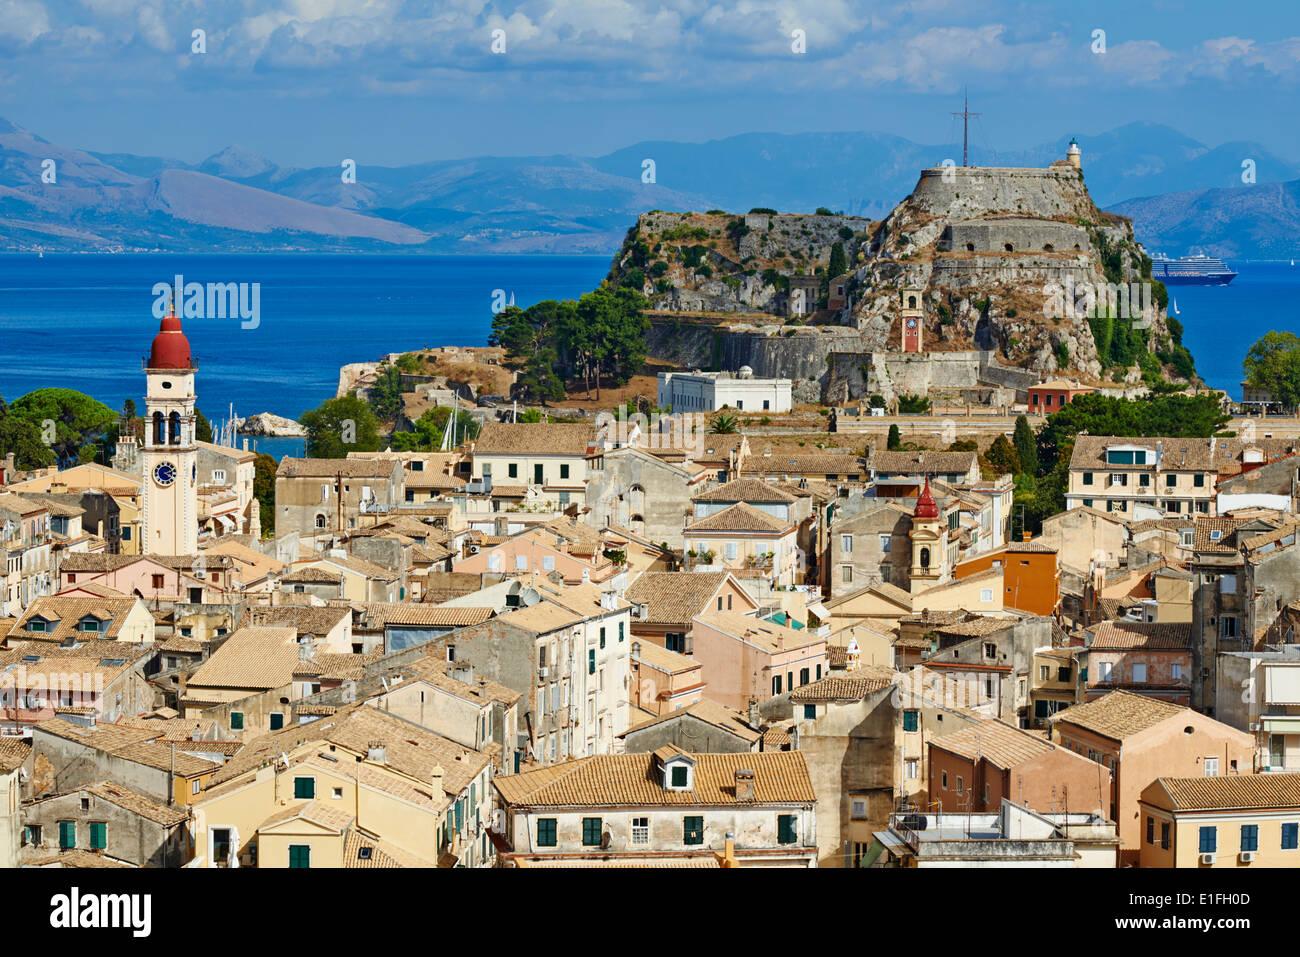 Greece, Ionian island, Corfu island, Kerkyra city, Unesco world heritage, the old Fortress and Agios Spyridon church - Stock Image